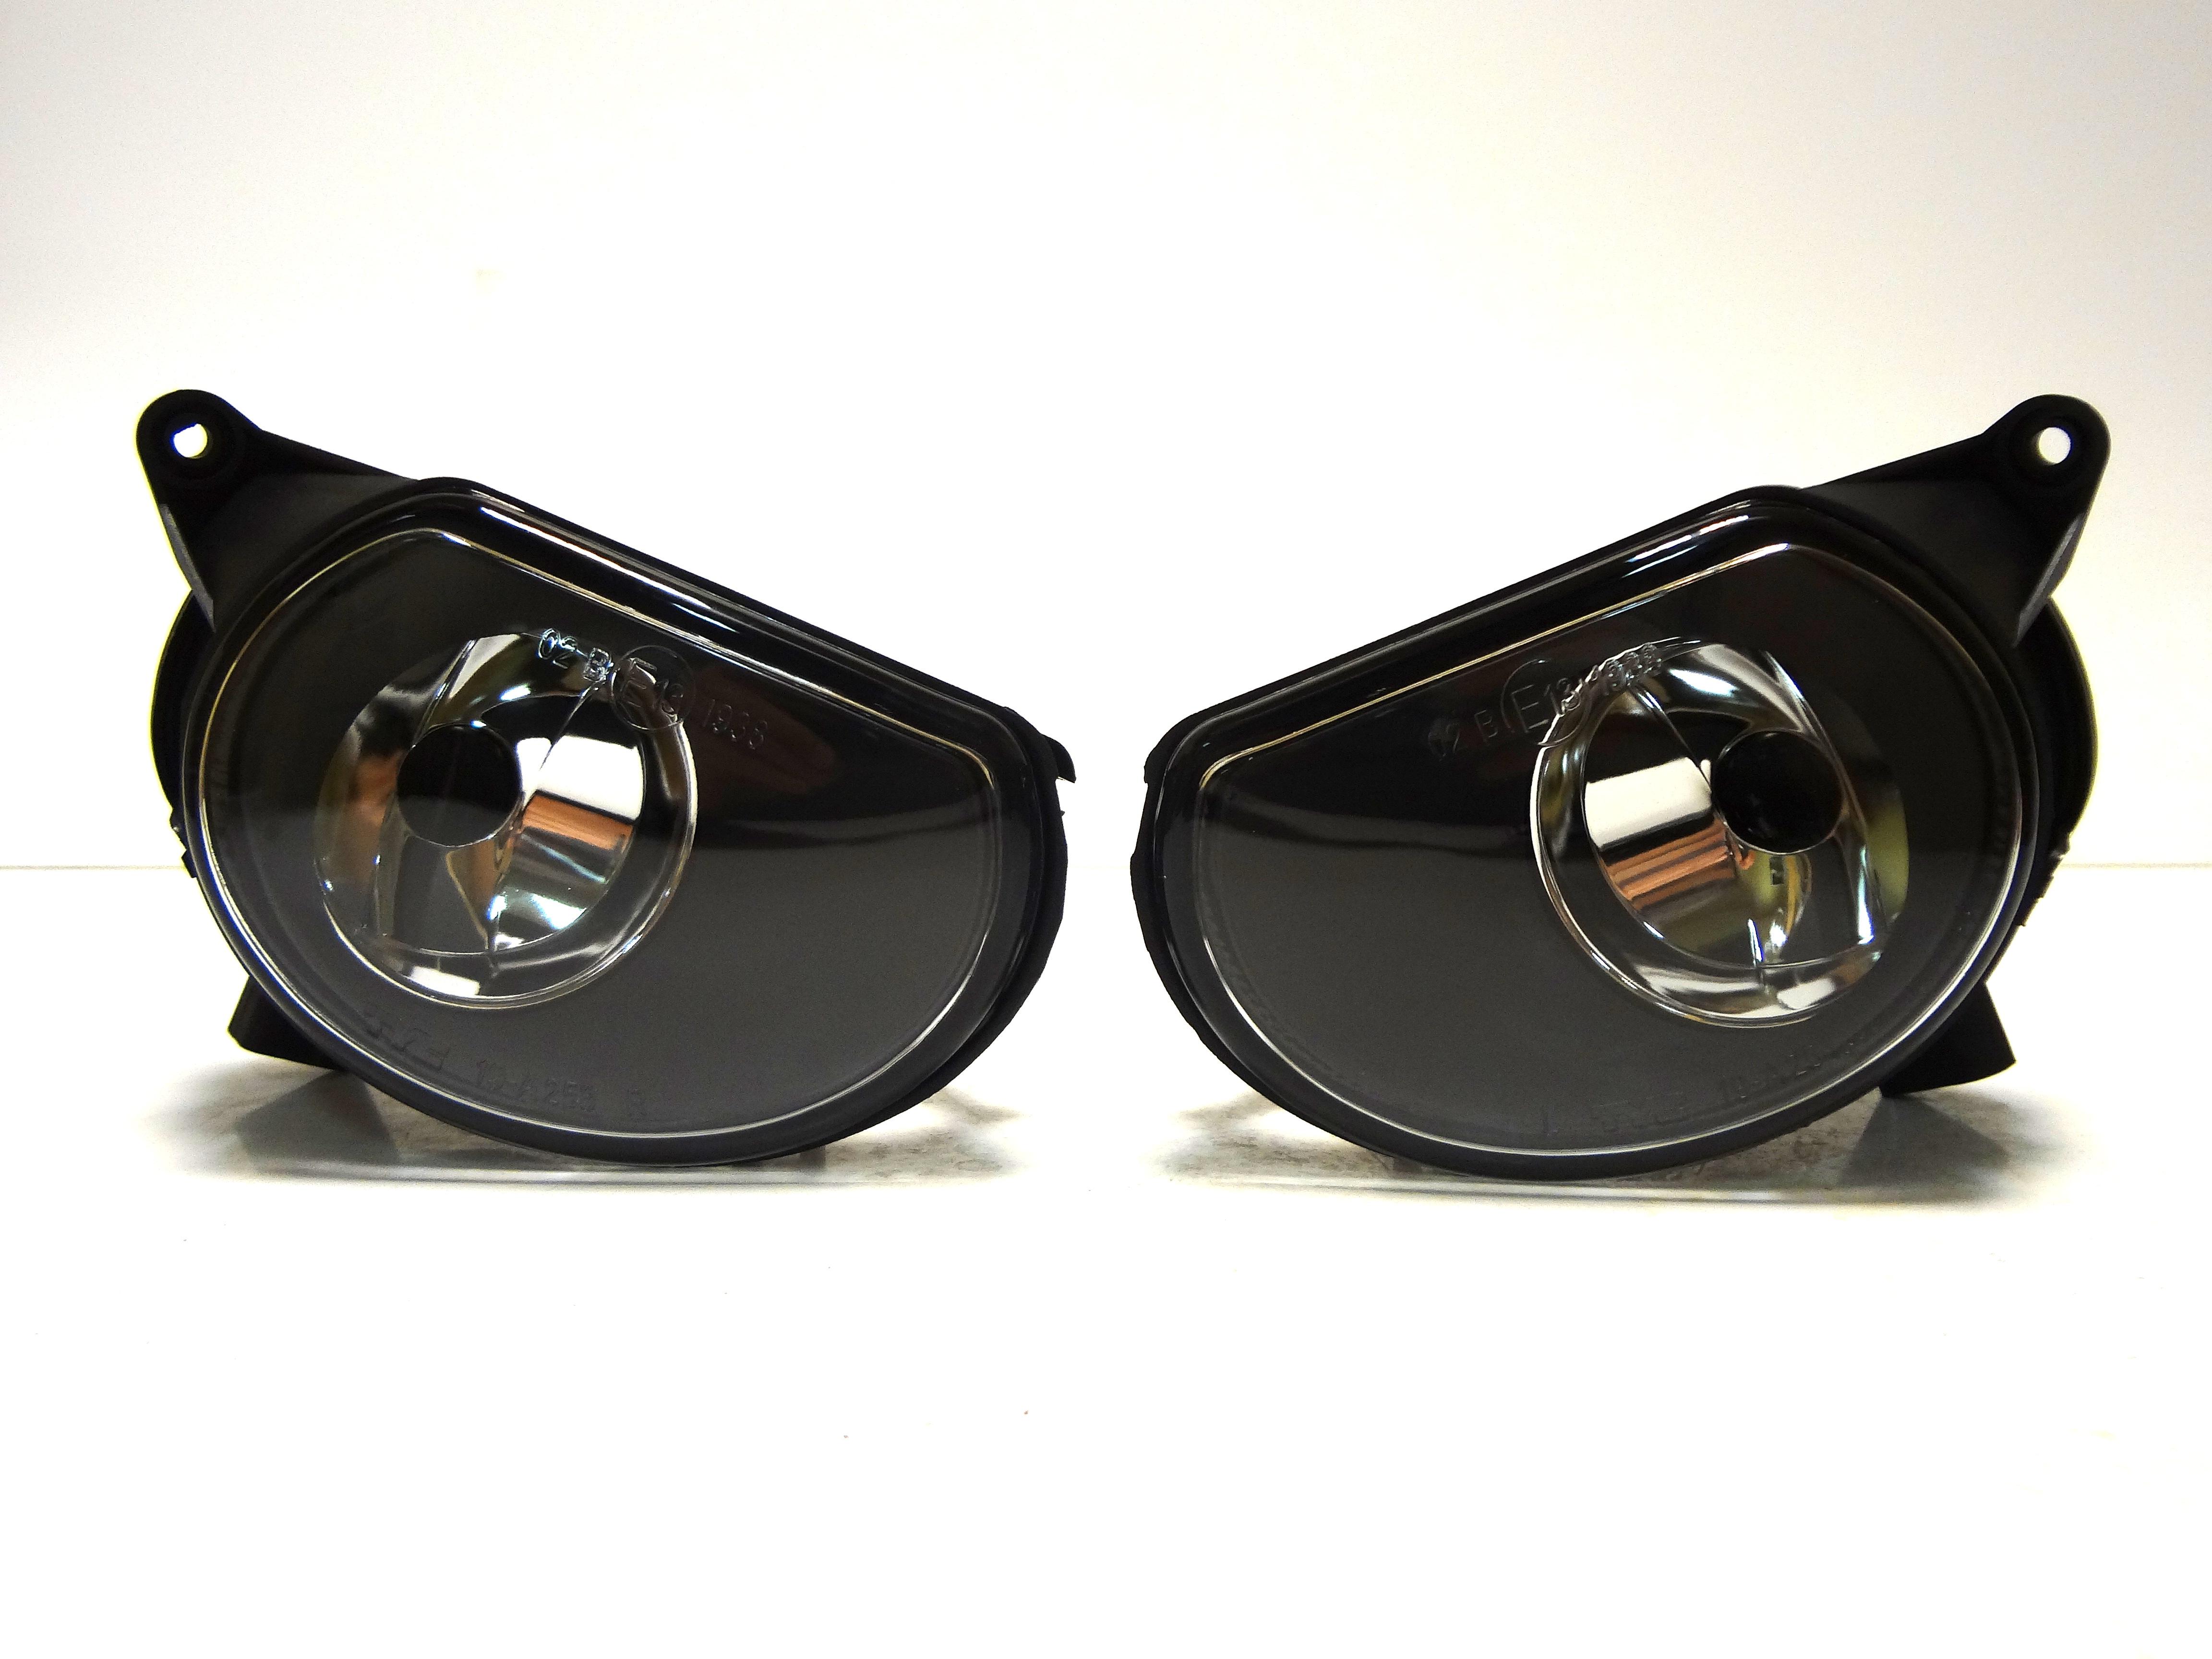 AUDI A3 2005-2008 front bumper LOWER GRILLE GRILL /& FOG LIGHTS SET NEW LH+RH